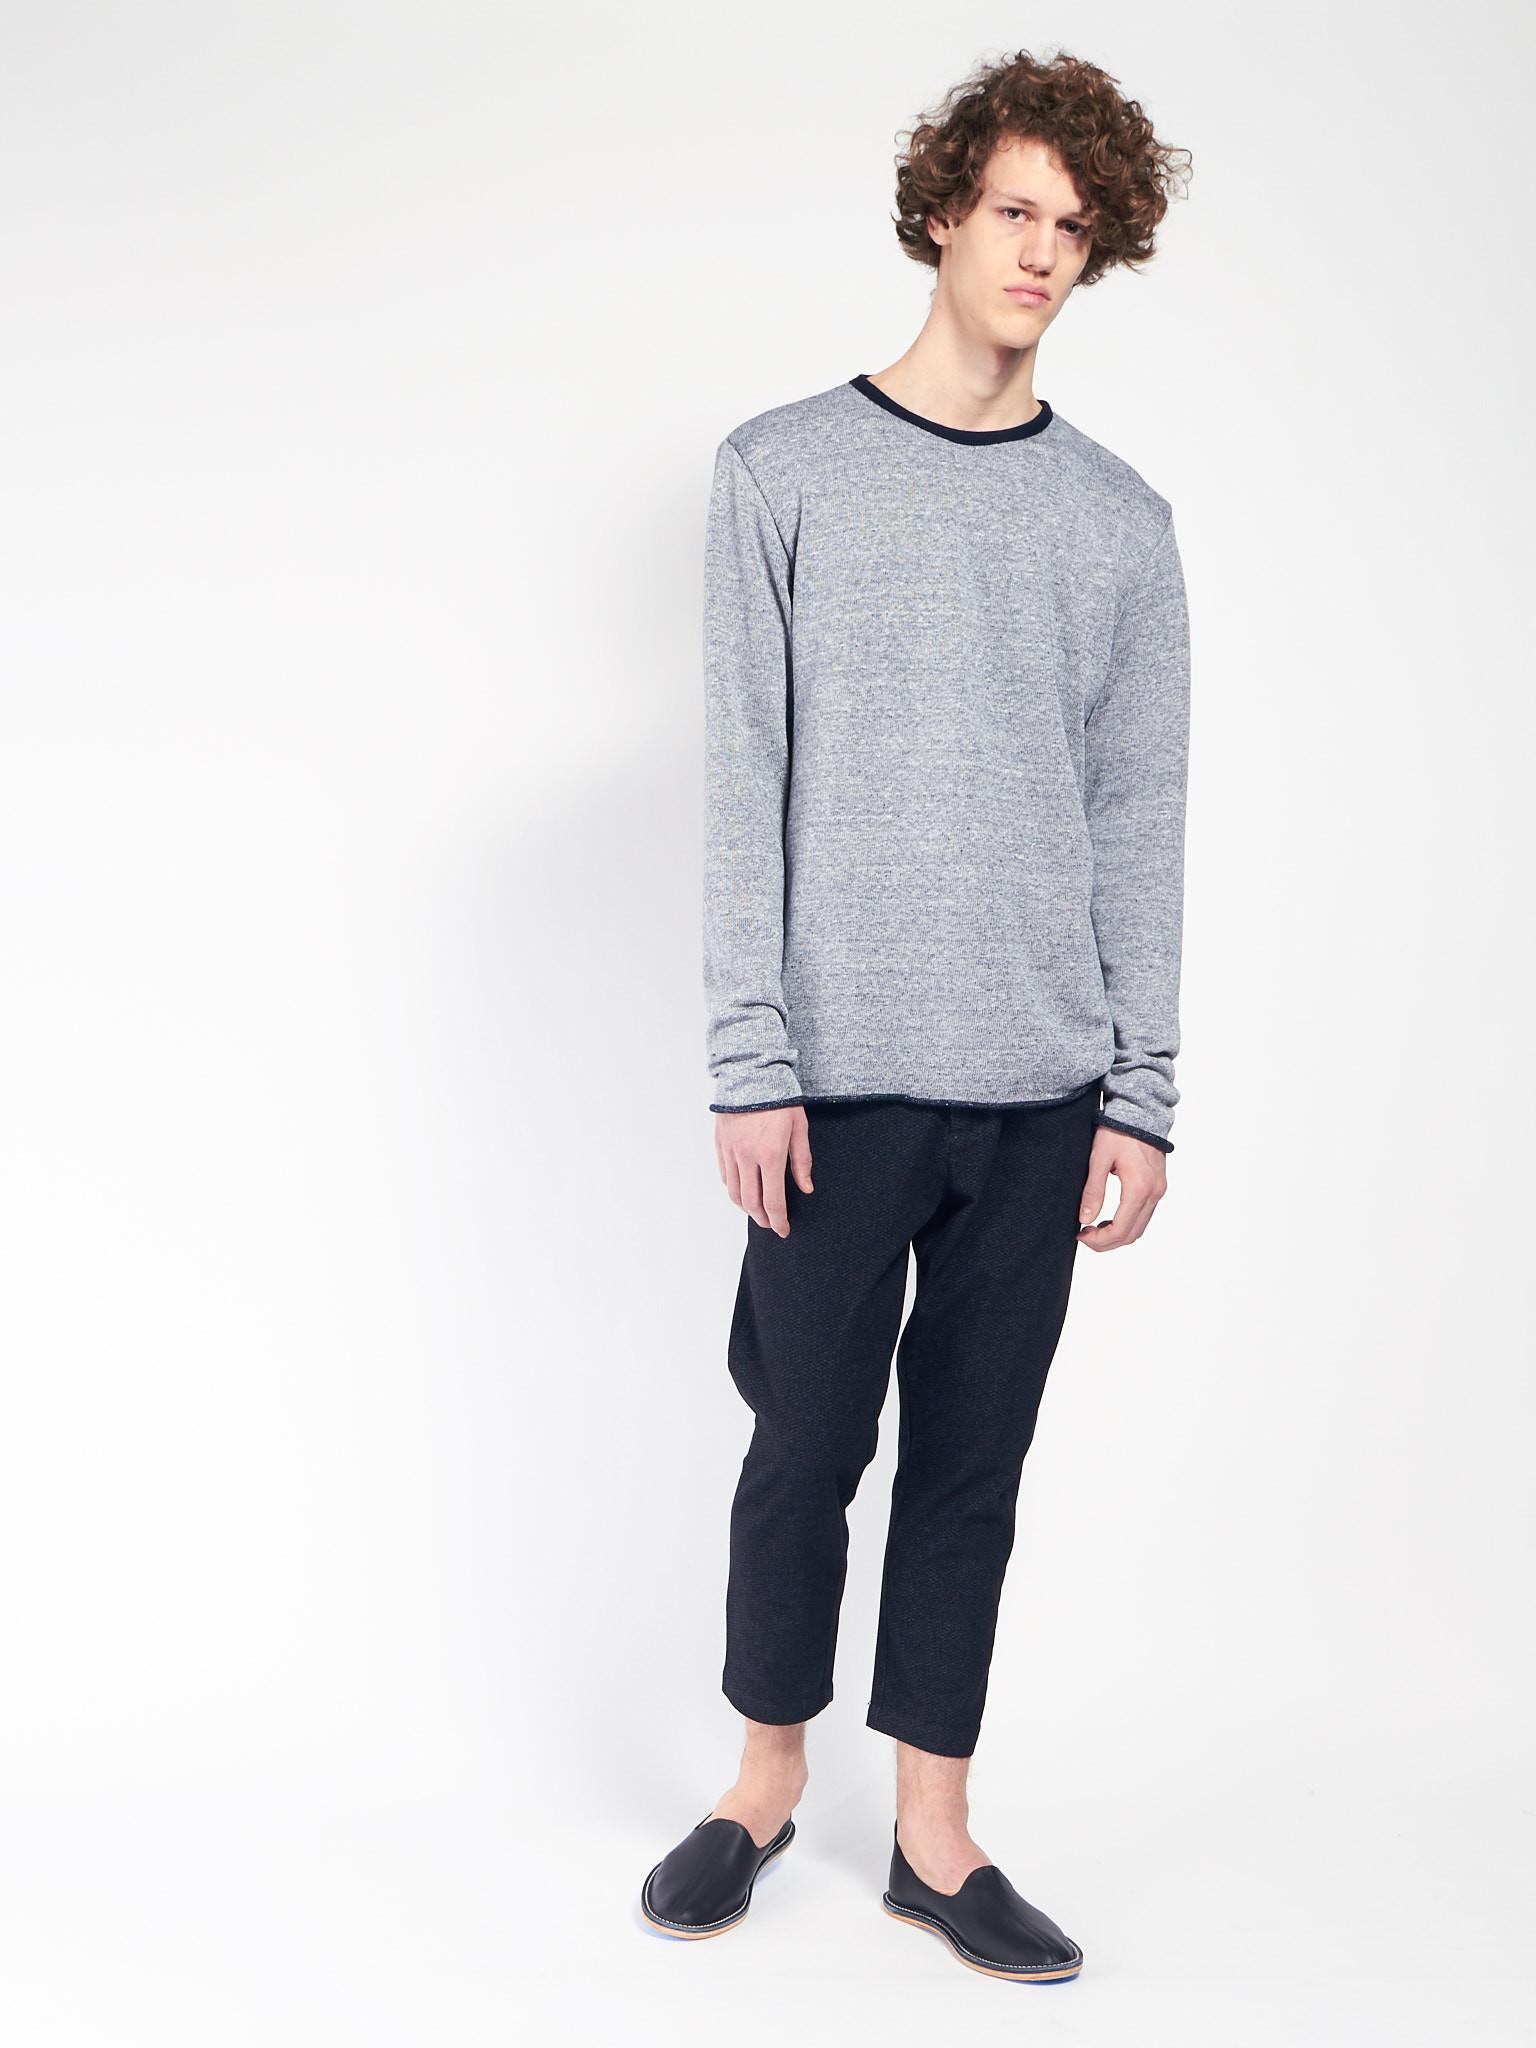 Knitting Journals Sale : Journal reef knit sweater garmentory